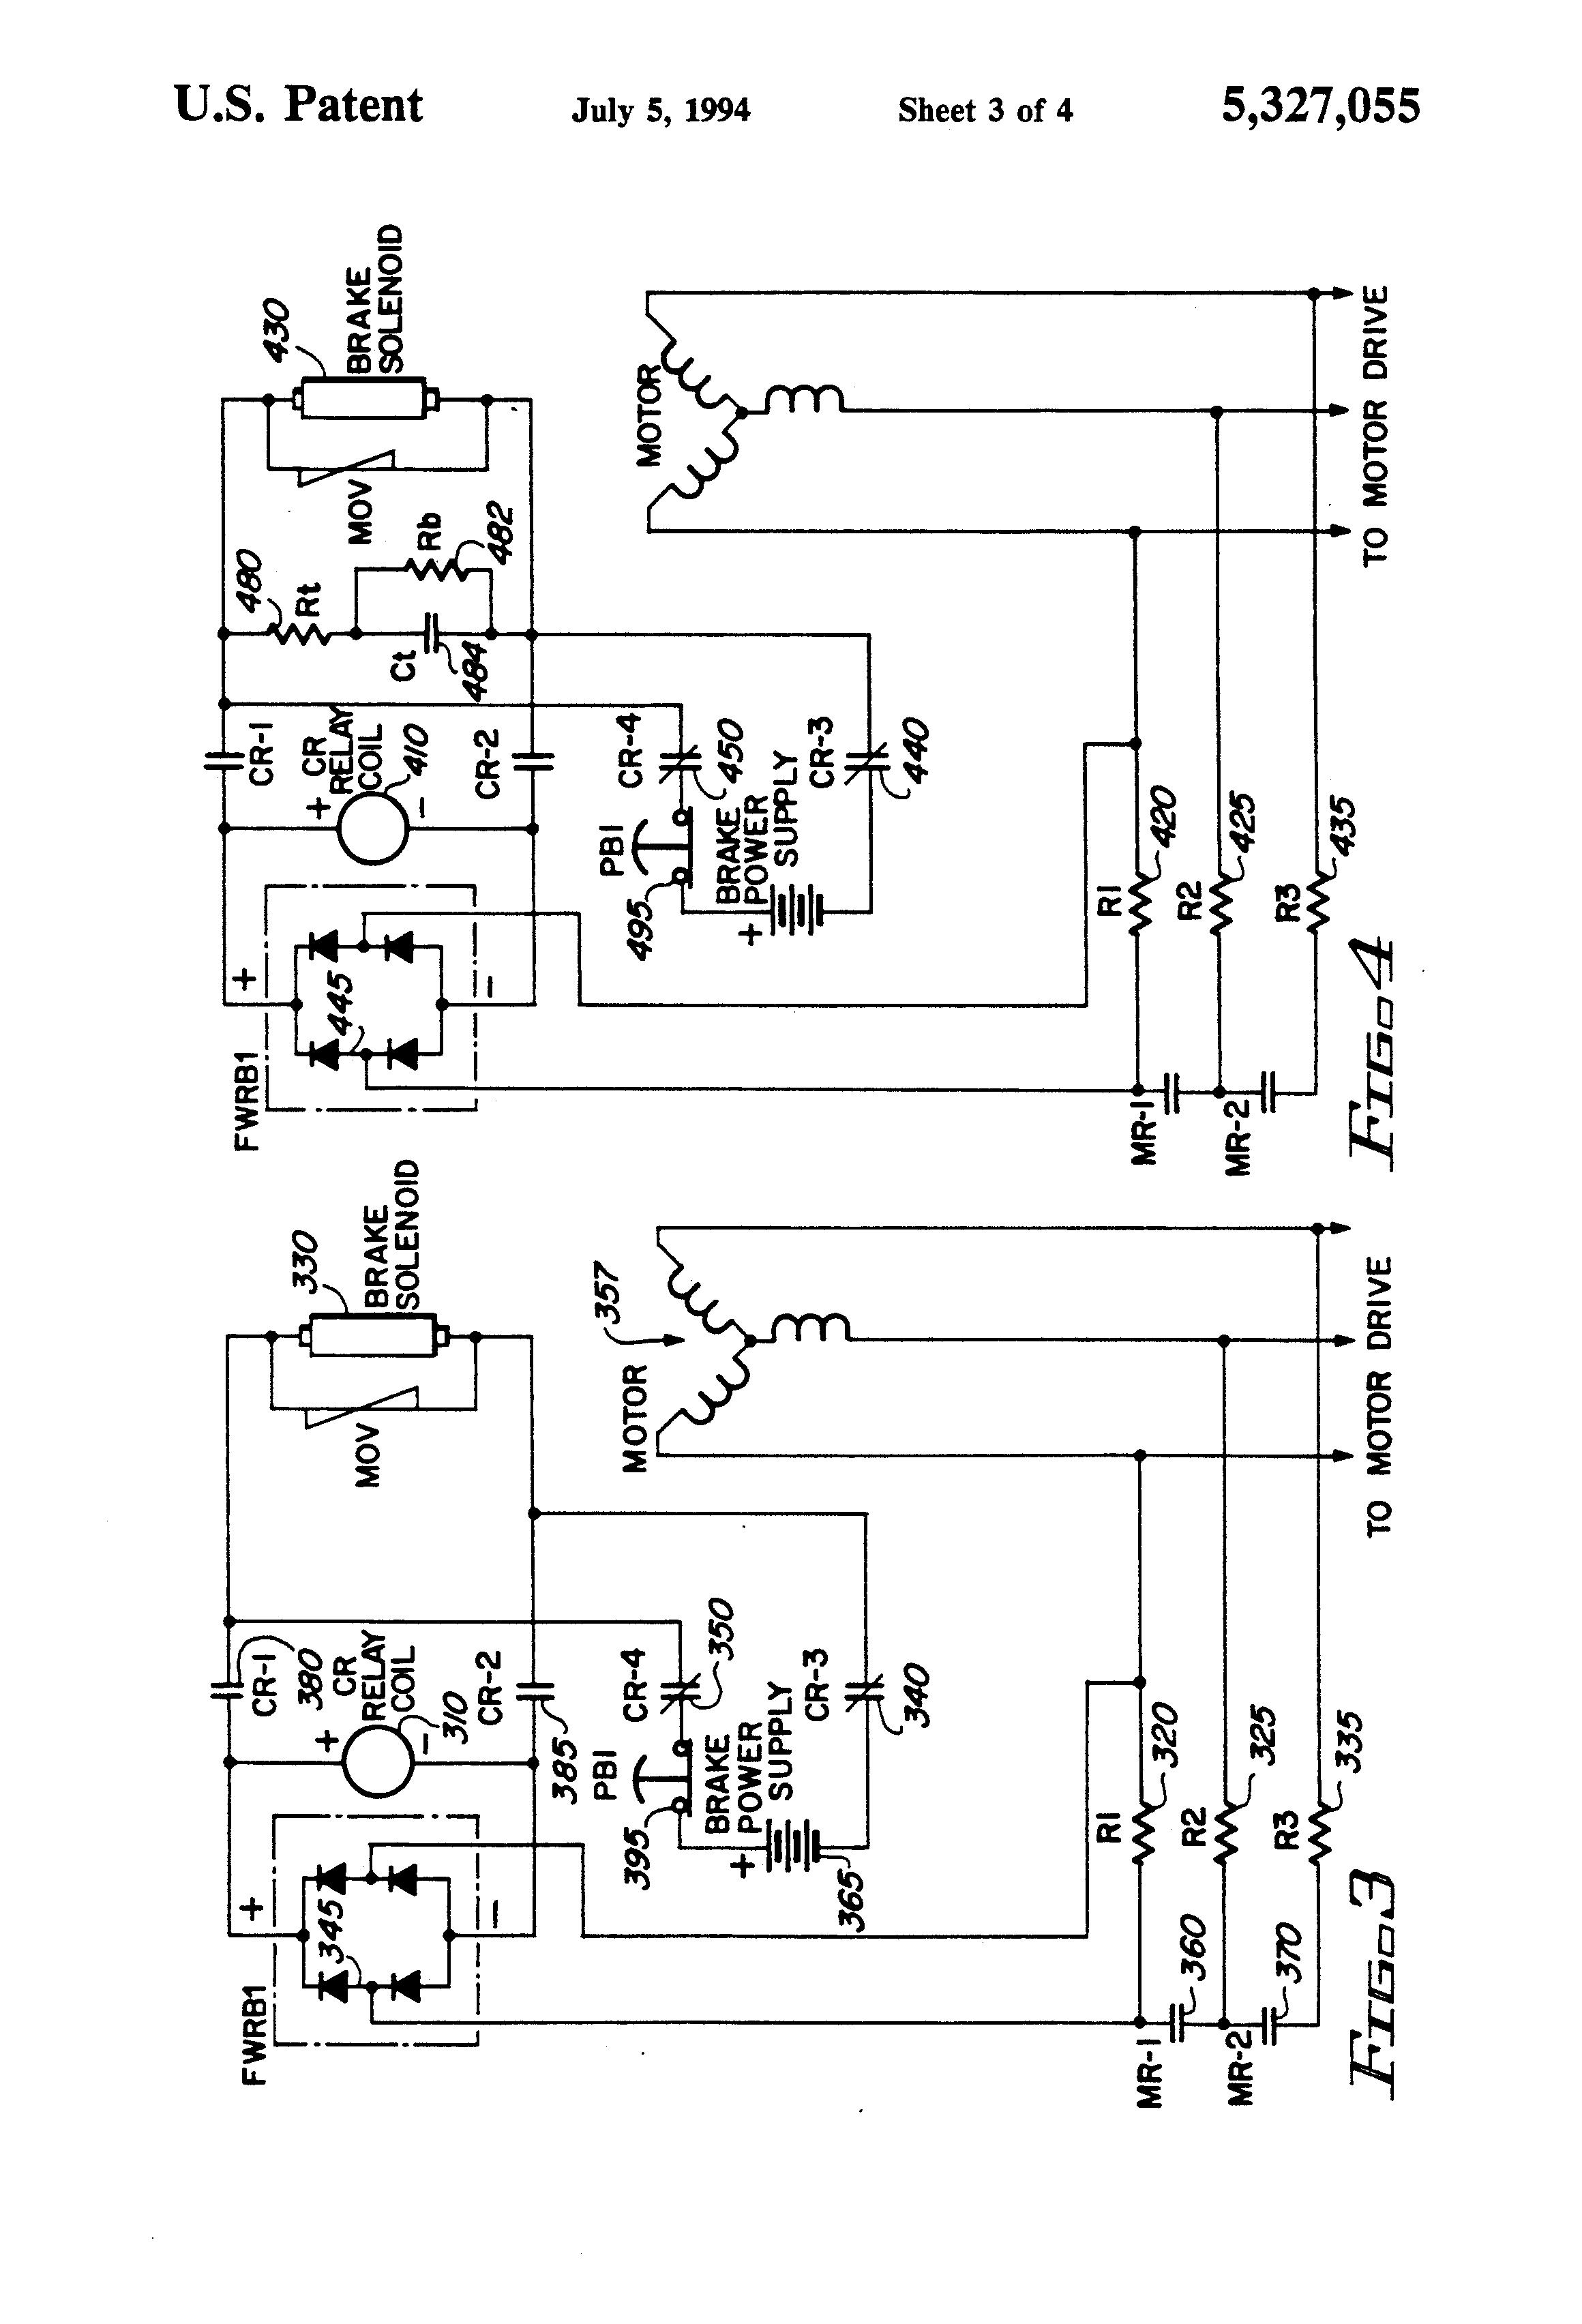 franklin electric motor wiring diagram - Wiring Diagram